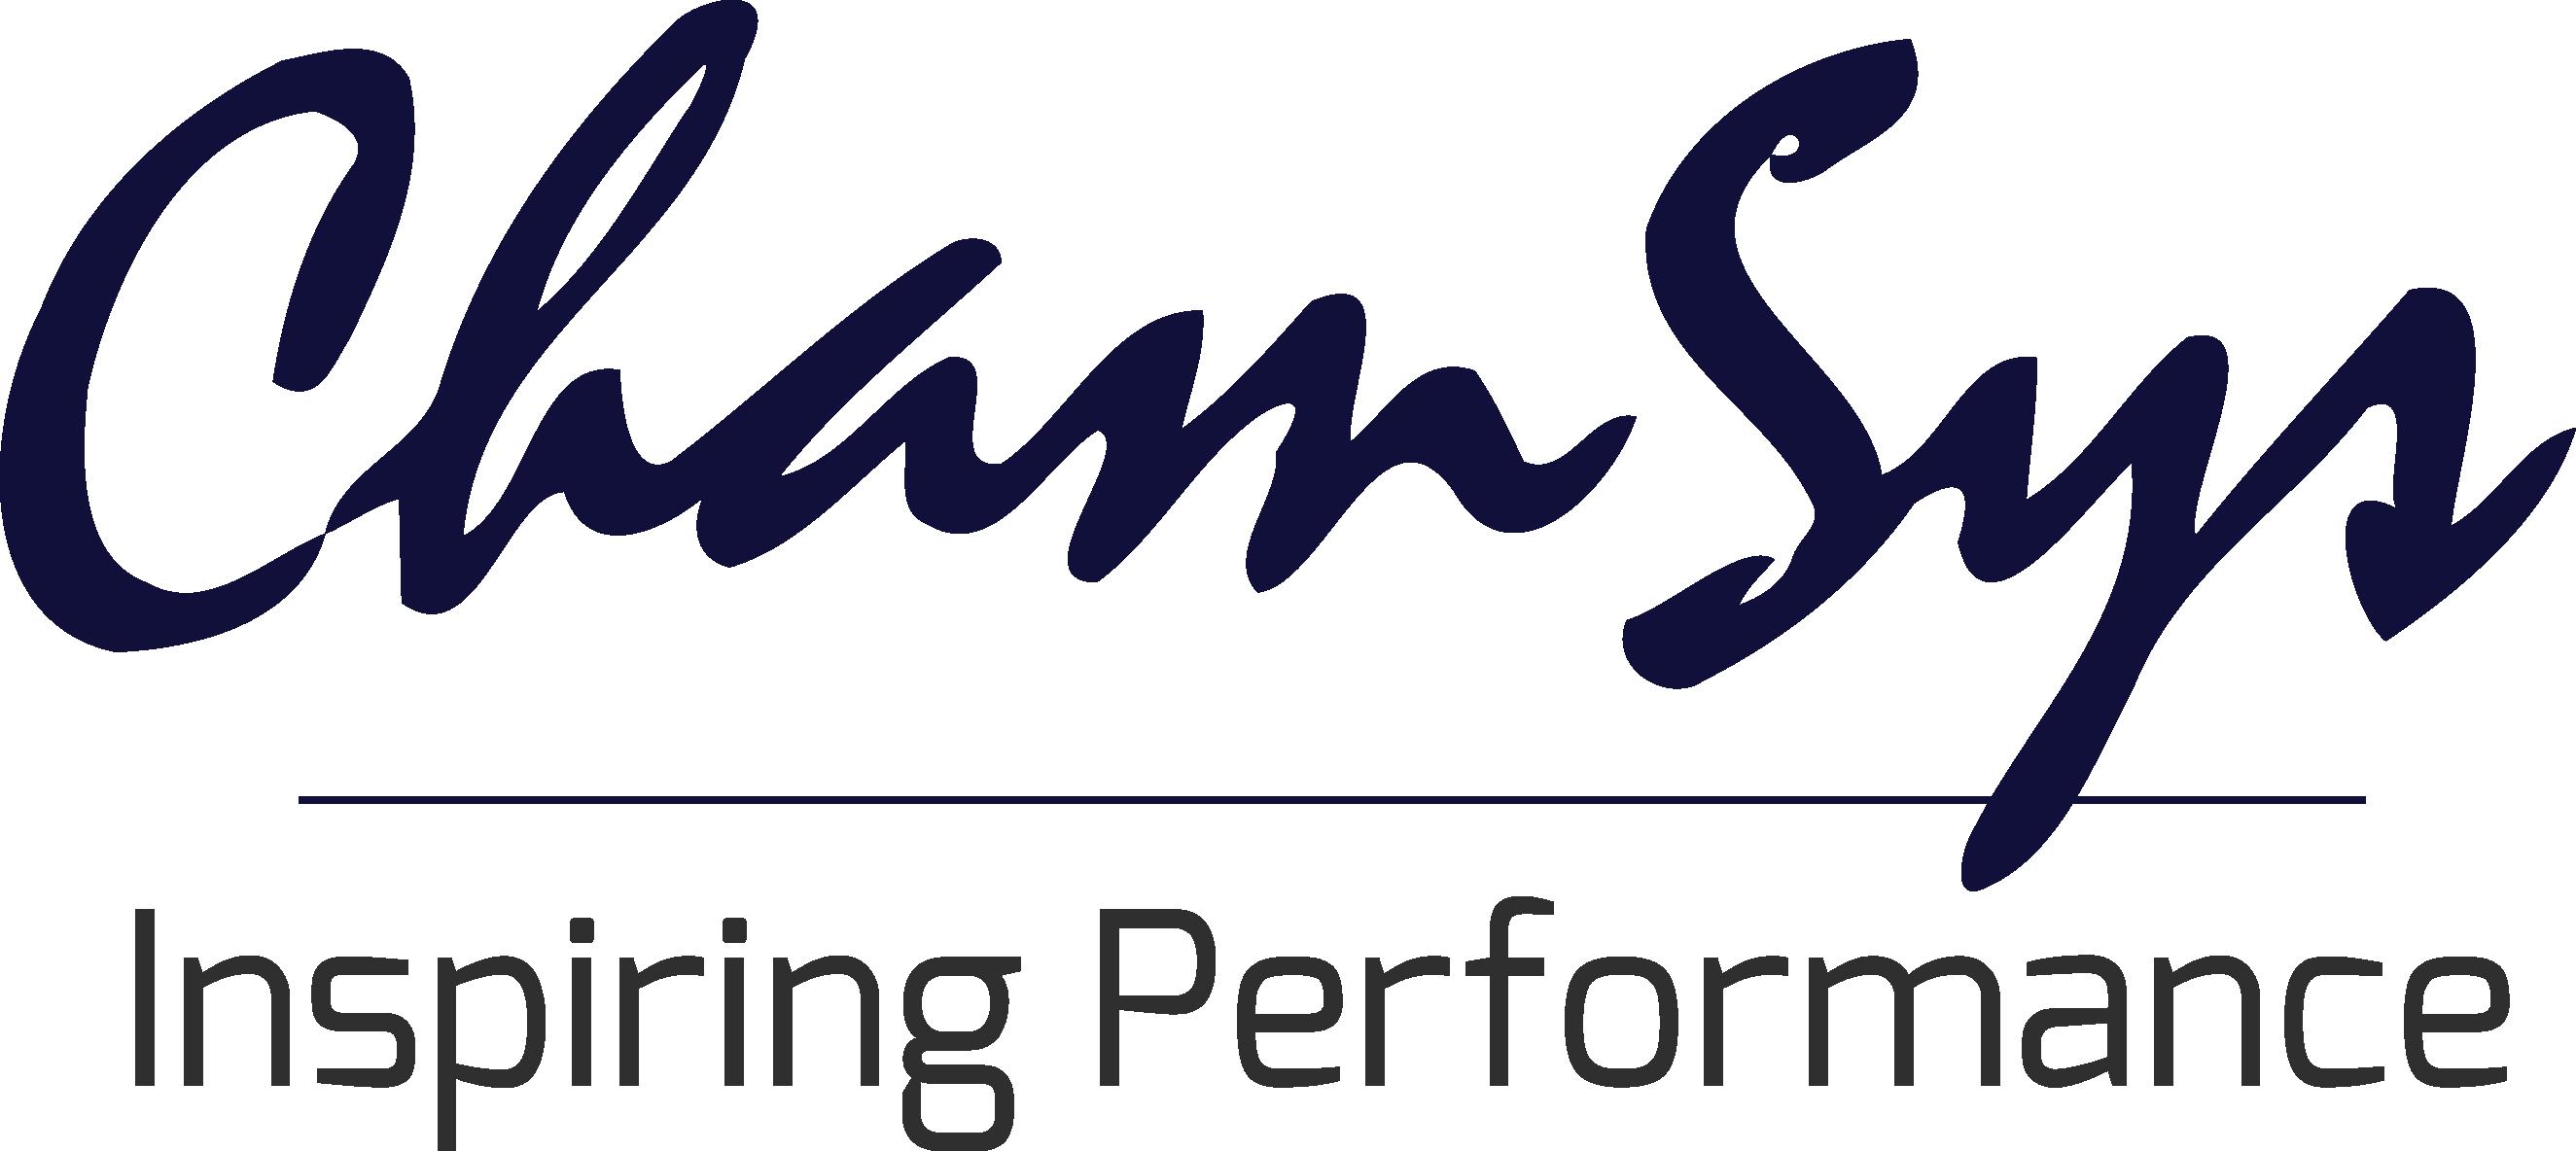 ChamSys Logo